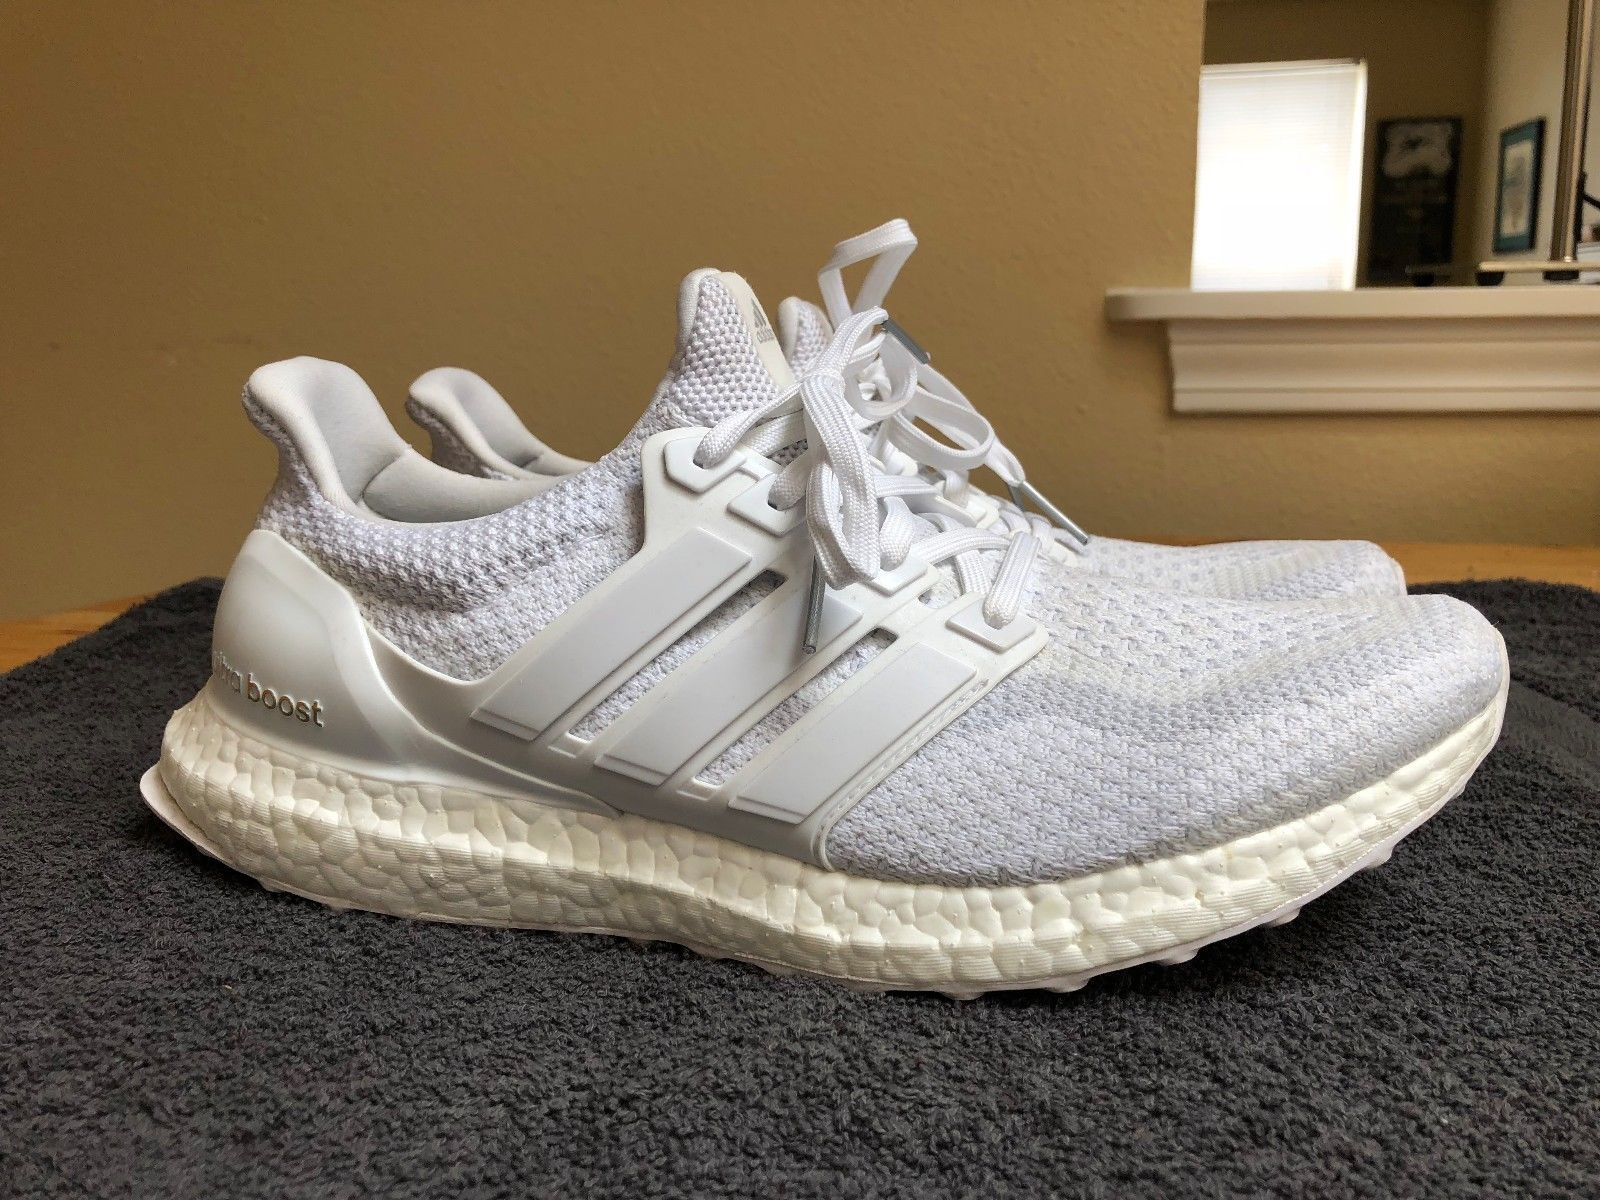 0436c9878c854 Adidas Ultra Boost UltraBoost 2.0 Triple White Aq5929 Size 10.5 Yeezy Kanye